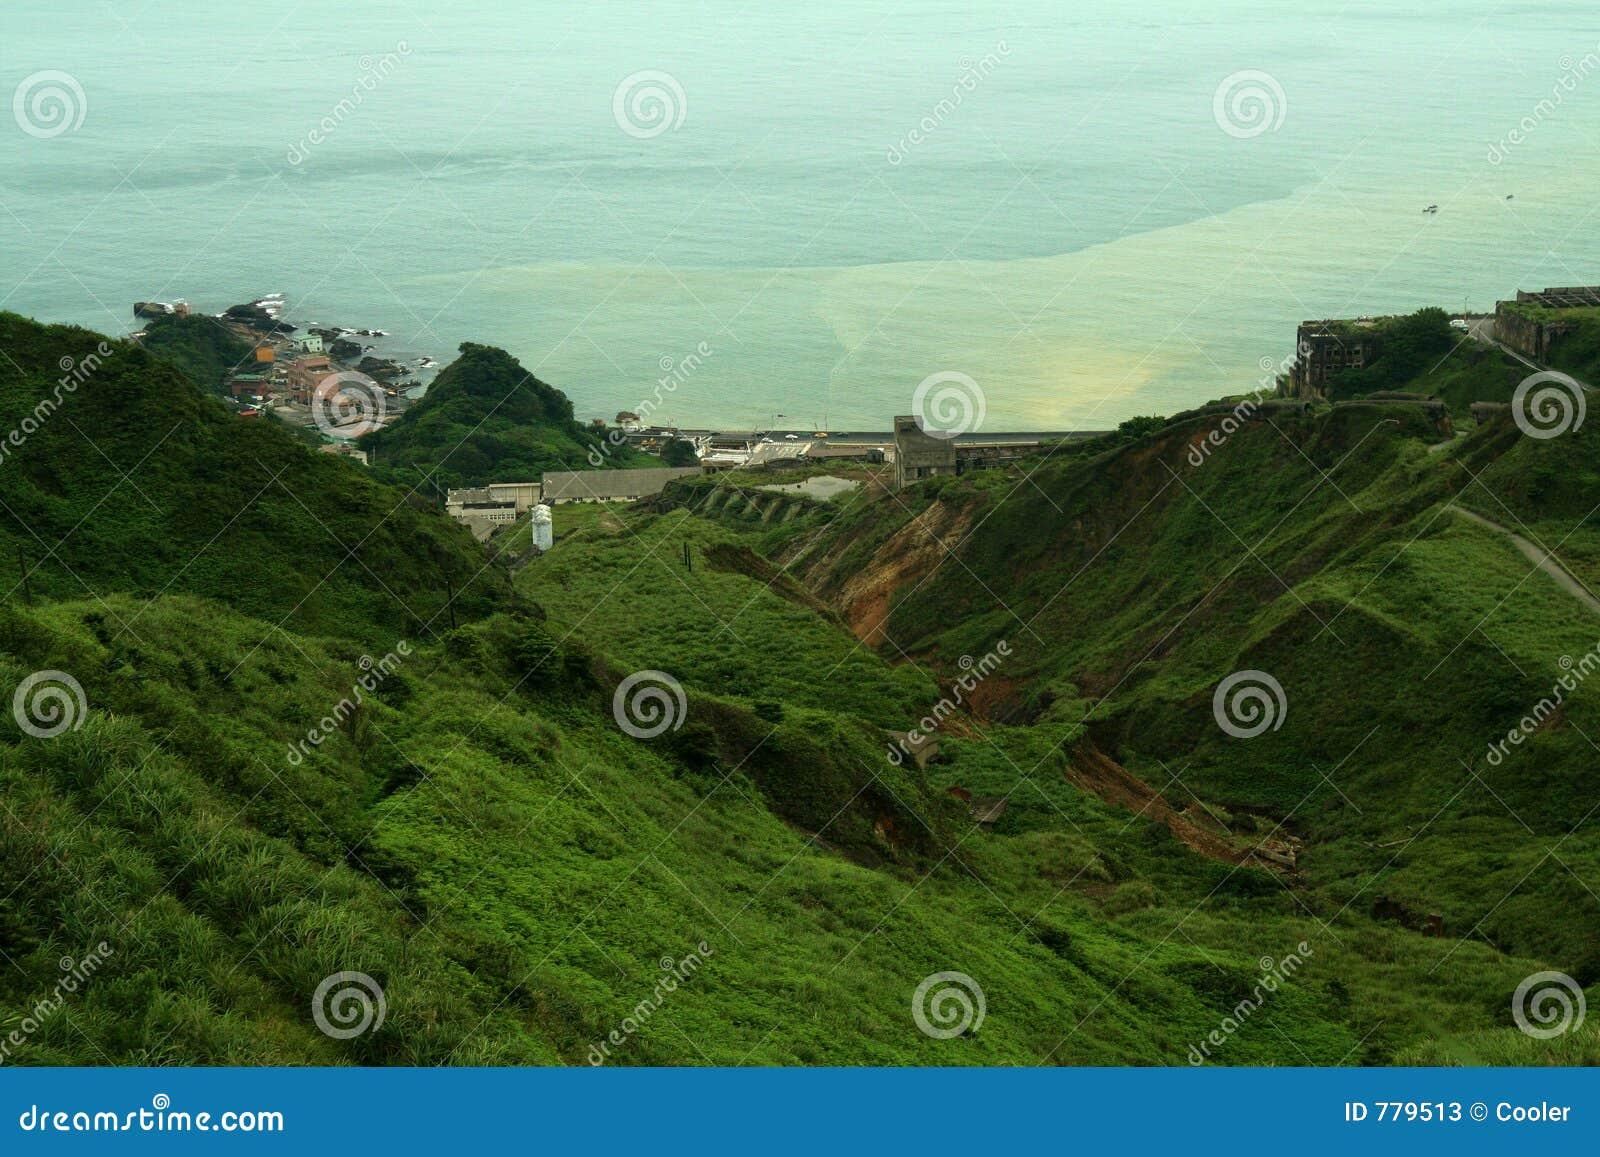 Horizontal Taiwan montagneux